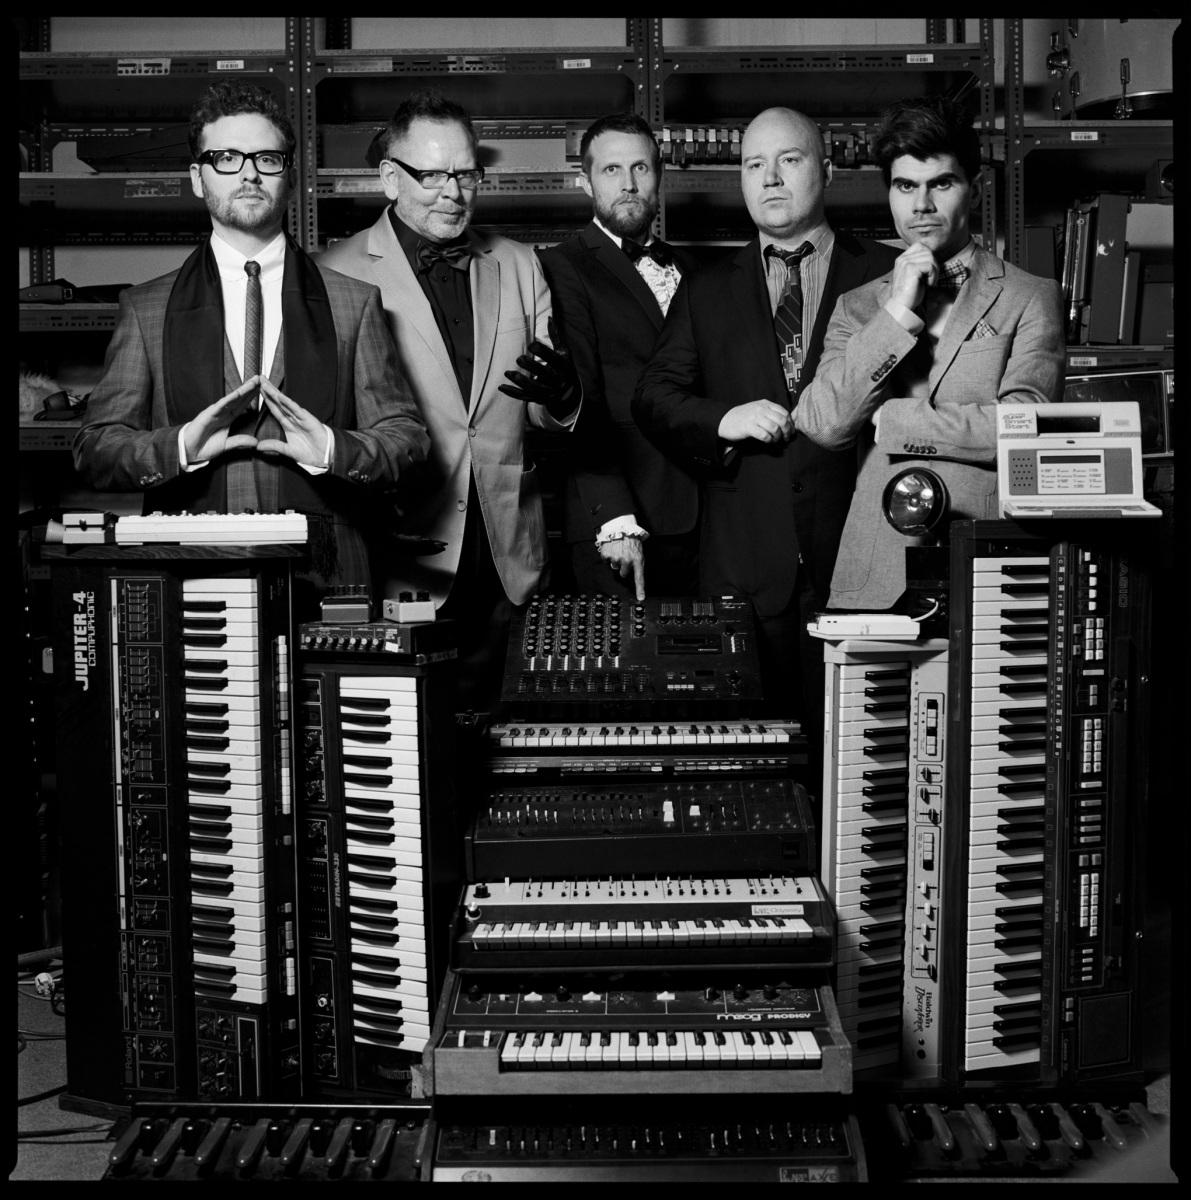 Apparat Organ Quartet - 123 Forever - YouTube